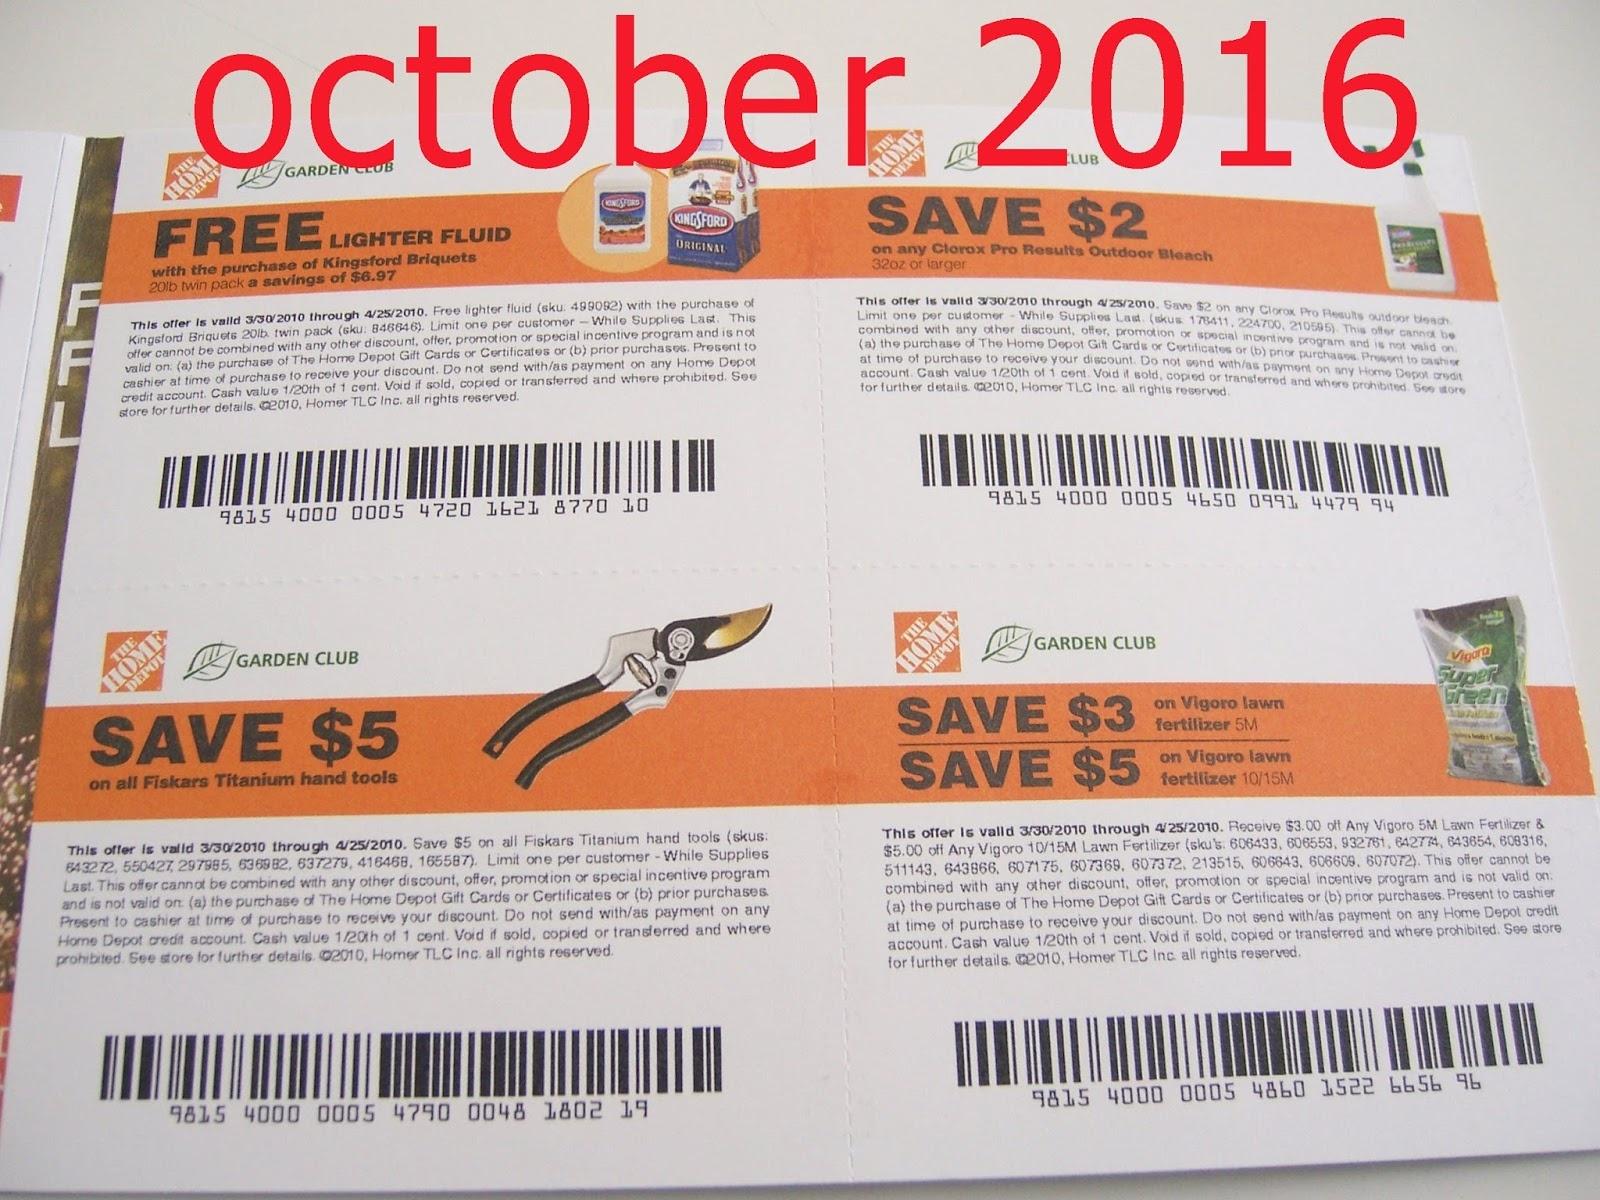 Homedepot Ca Coupon Code : Dealsoftoday Eu Review - Free Printable Home Depot Coupons